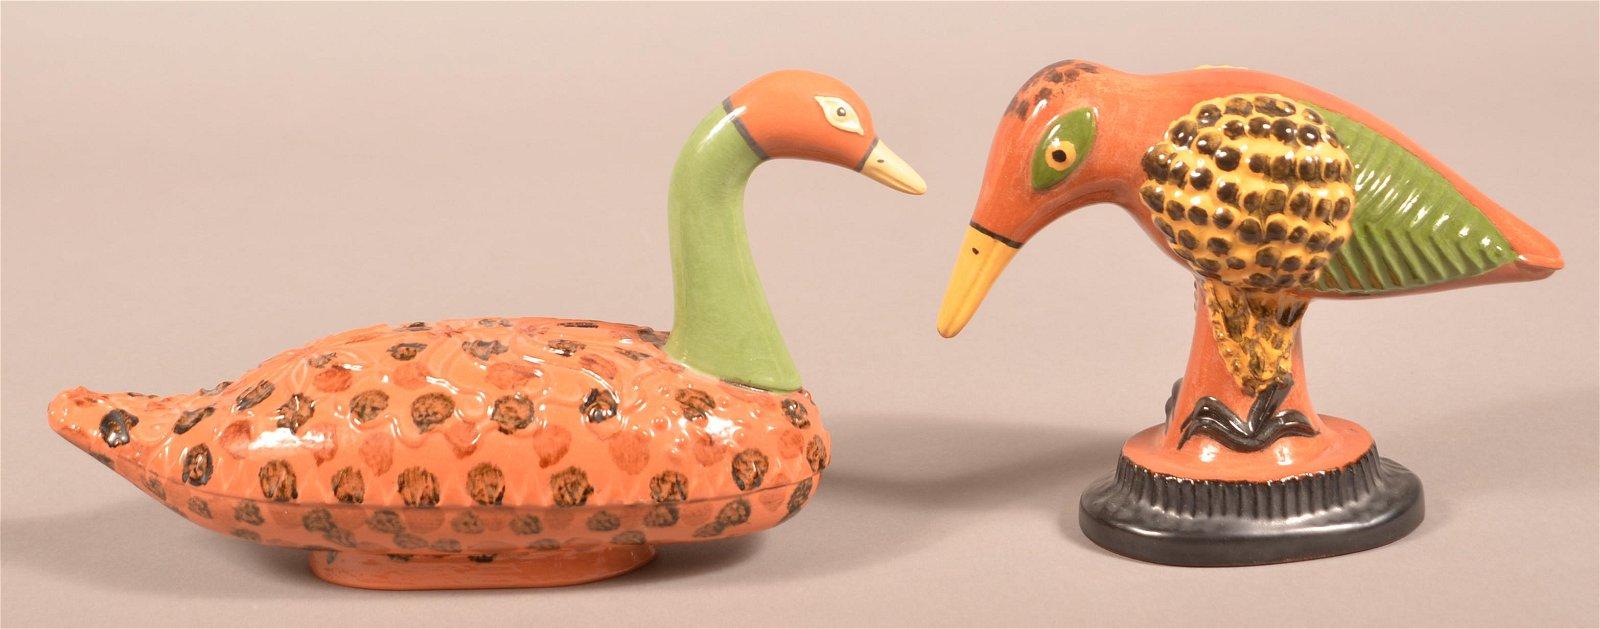 2 James Seagreaves Glazed Redware Bird Figurines.